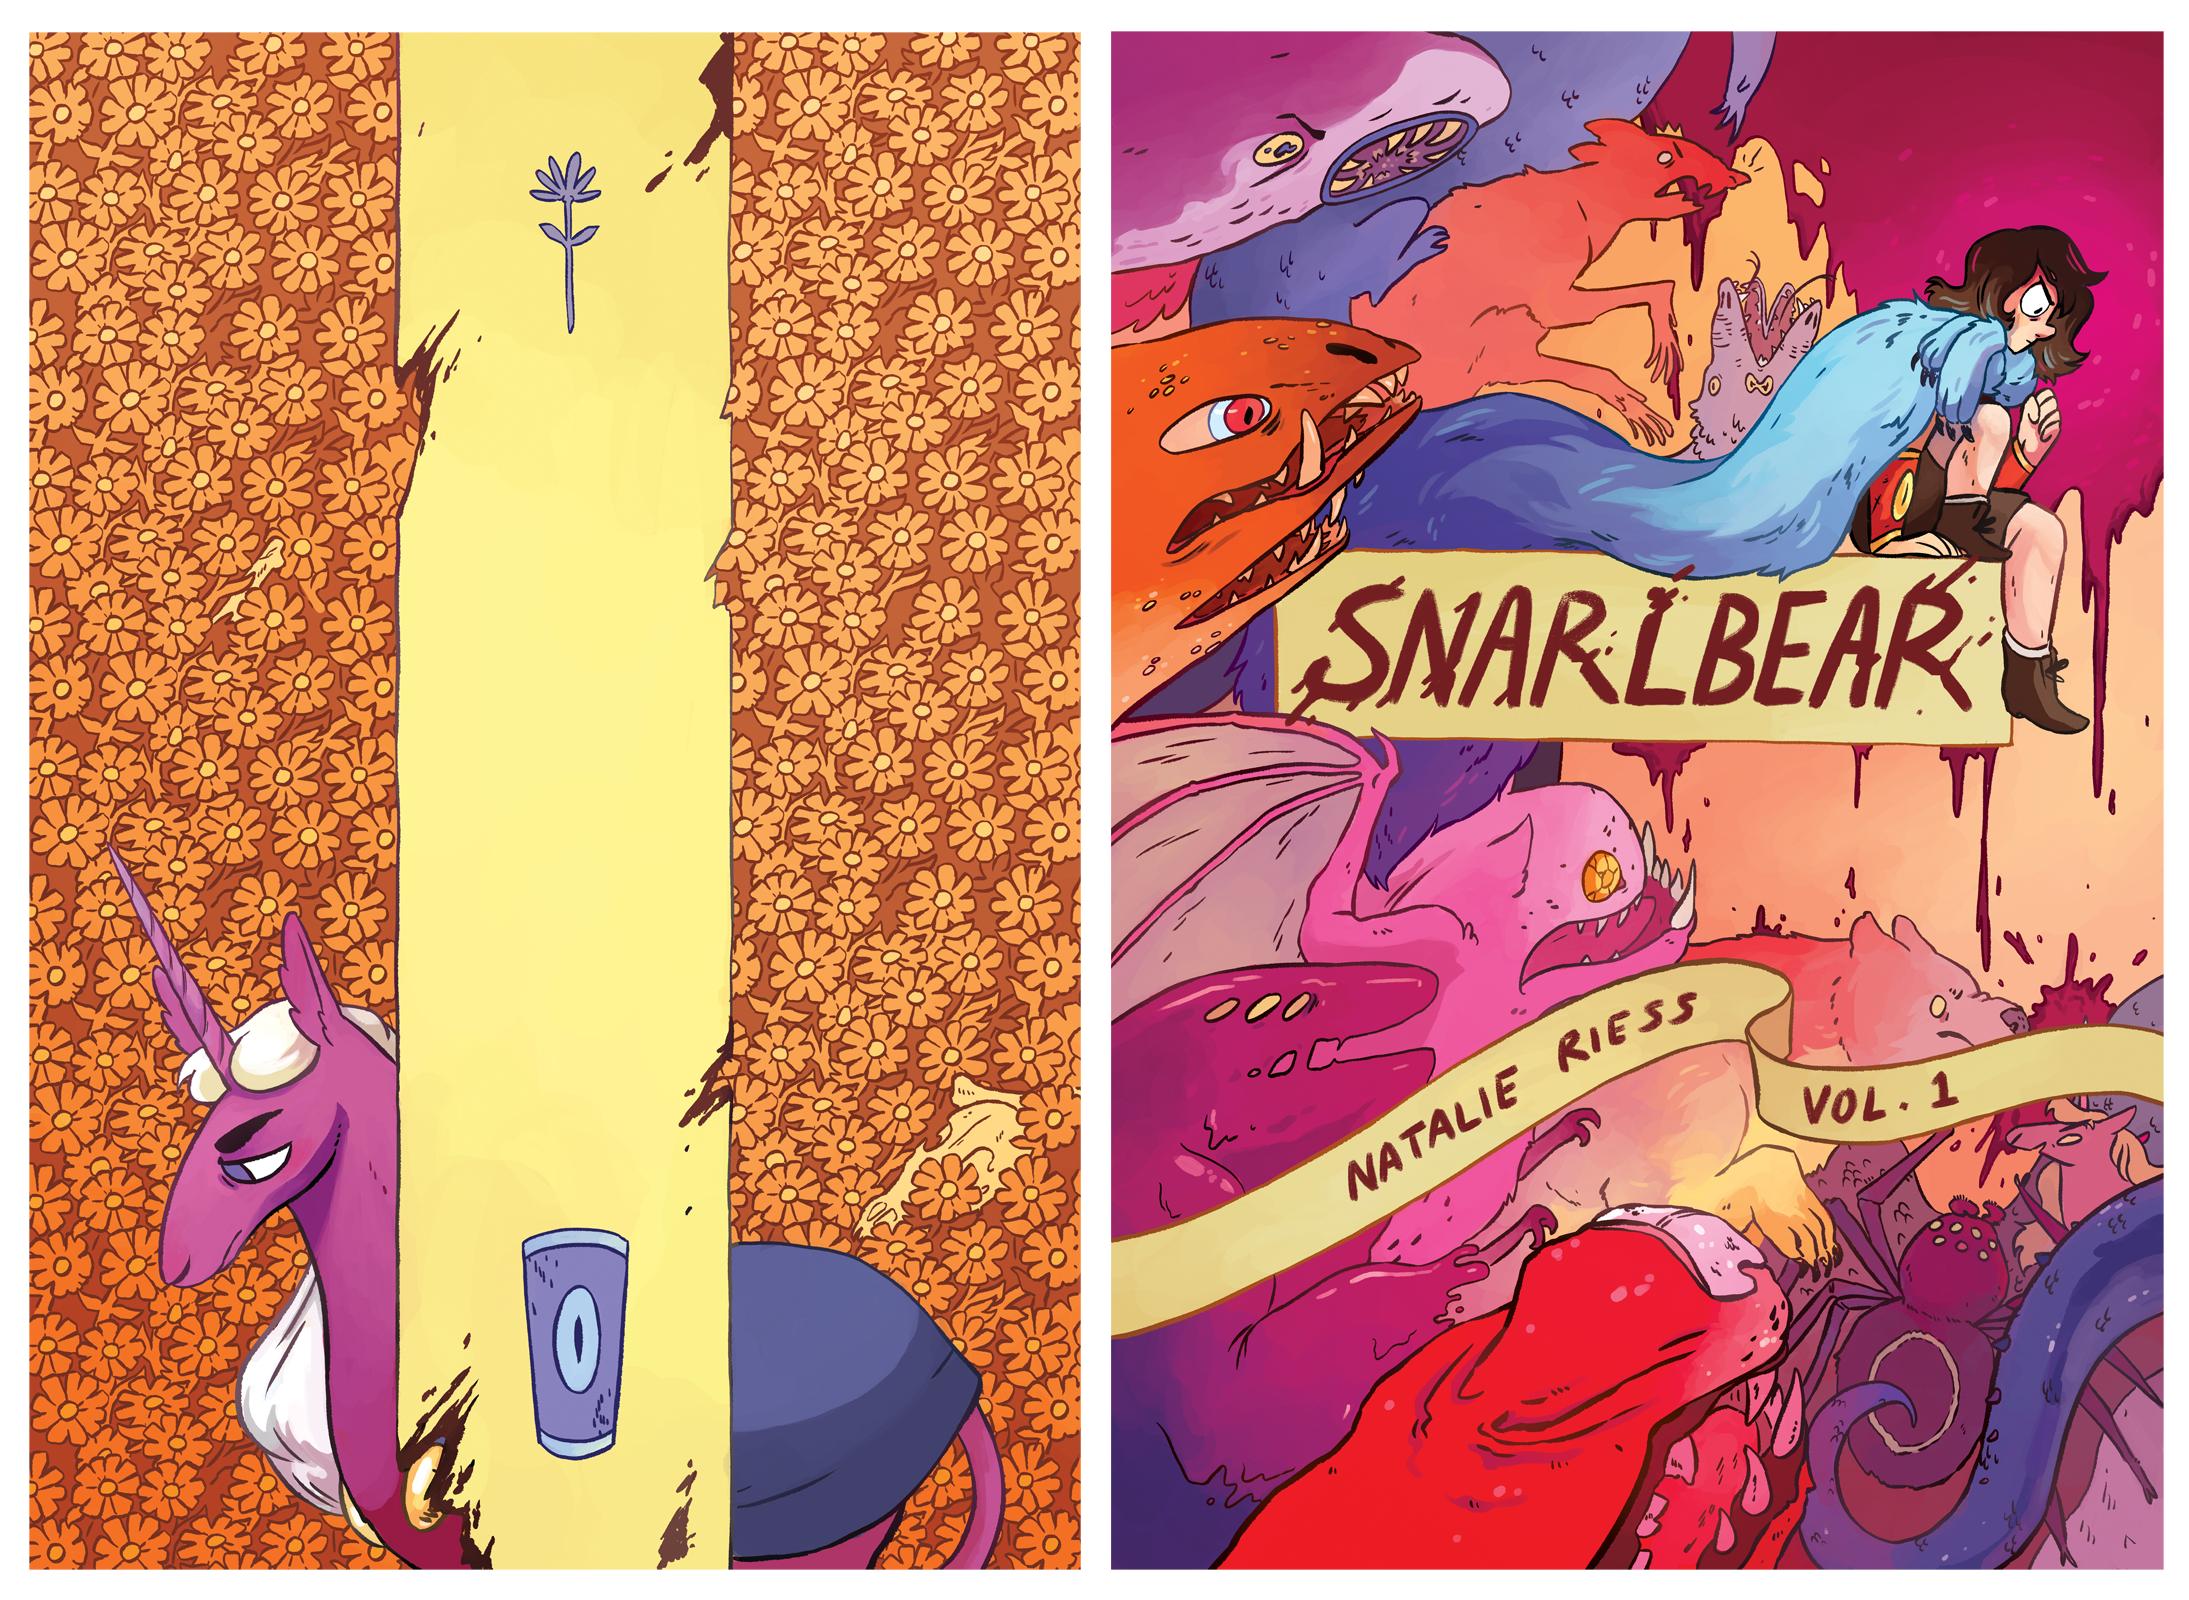 Snarlbear Vol 1 Covers